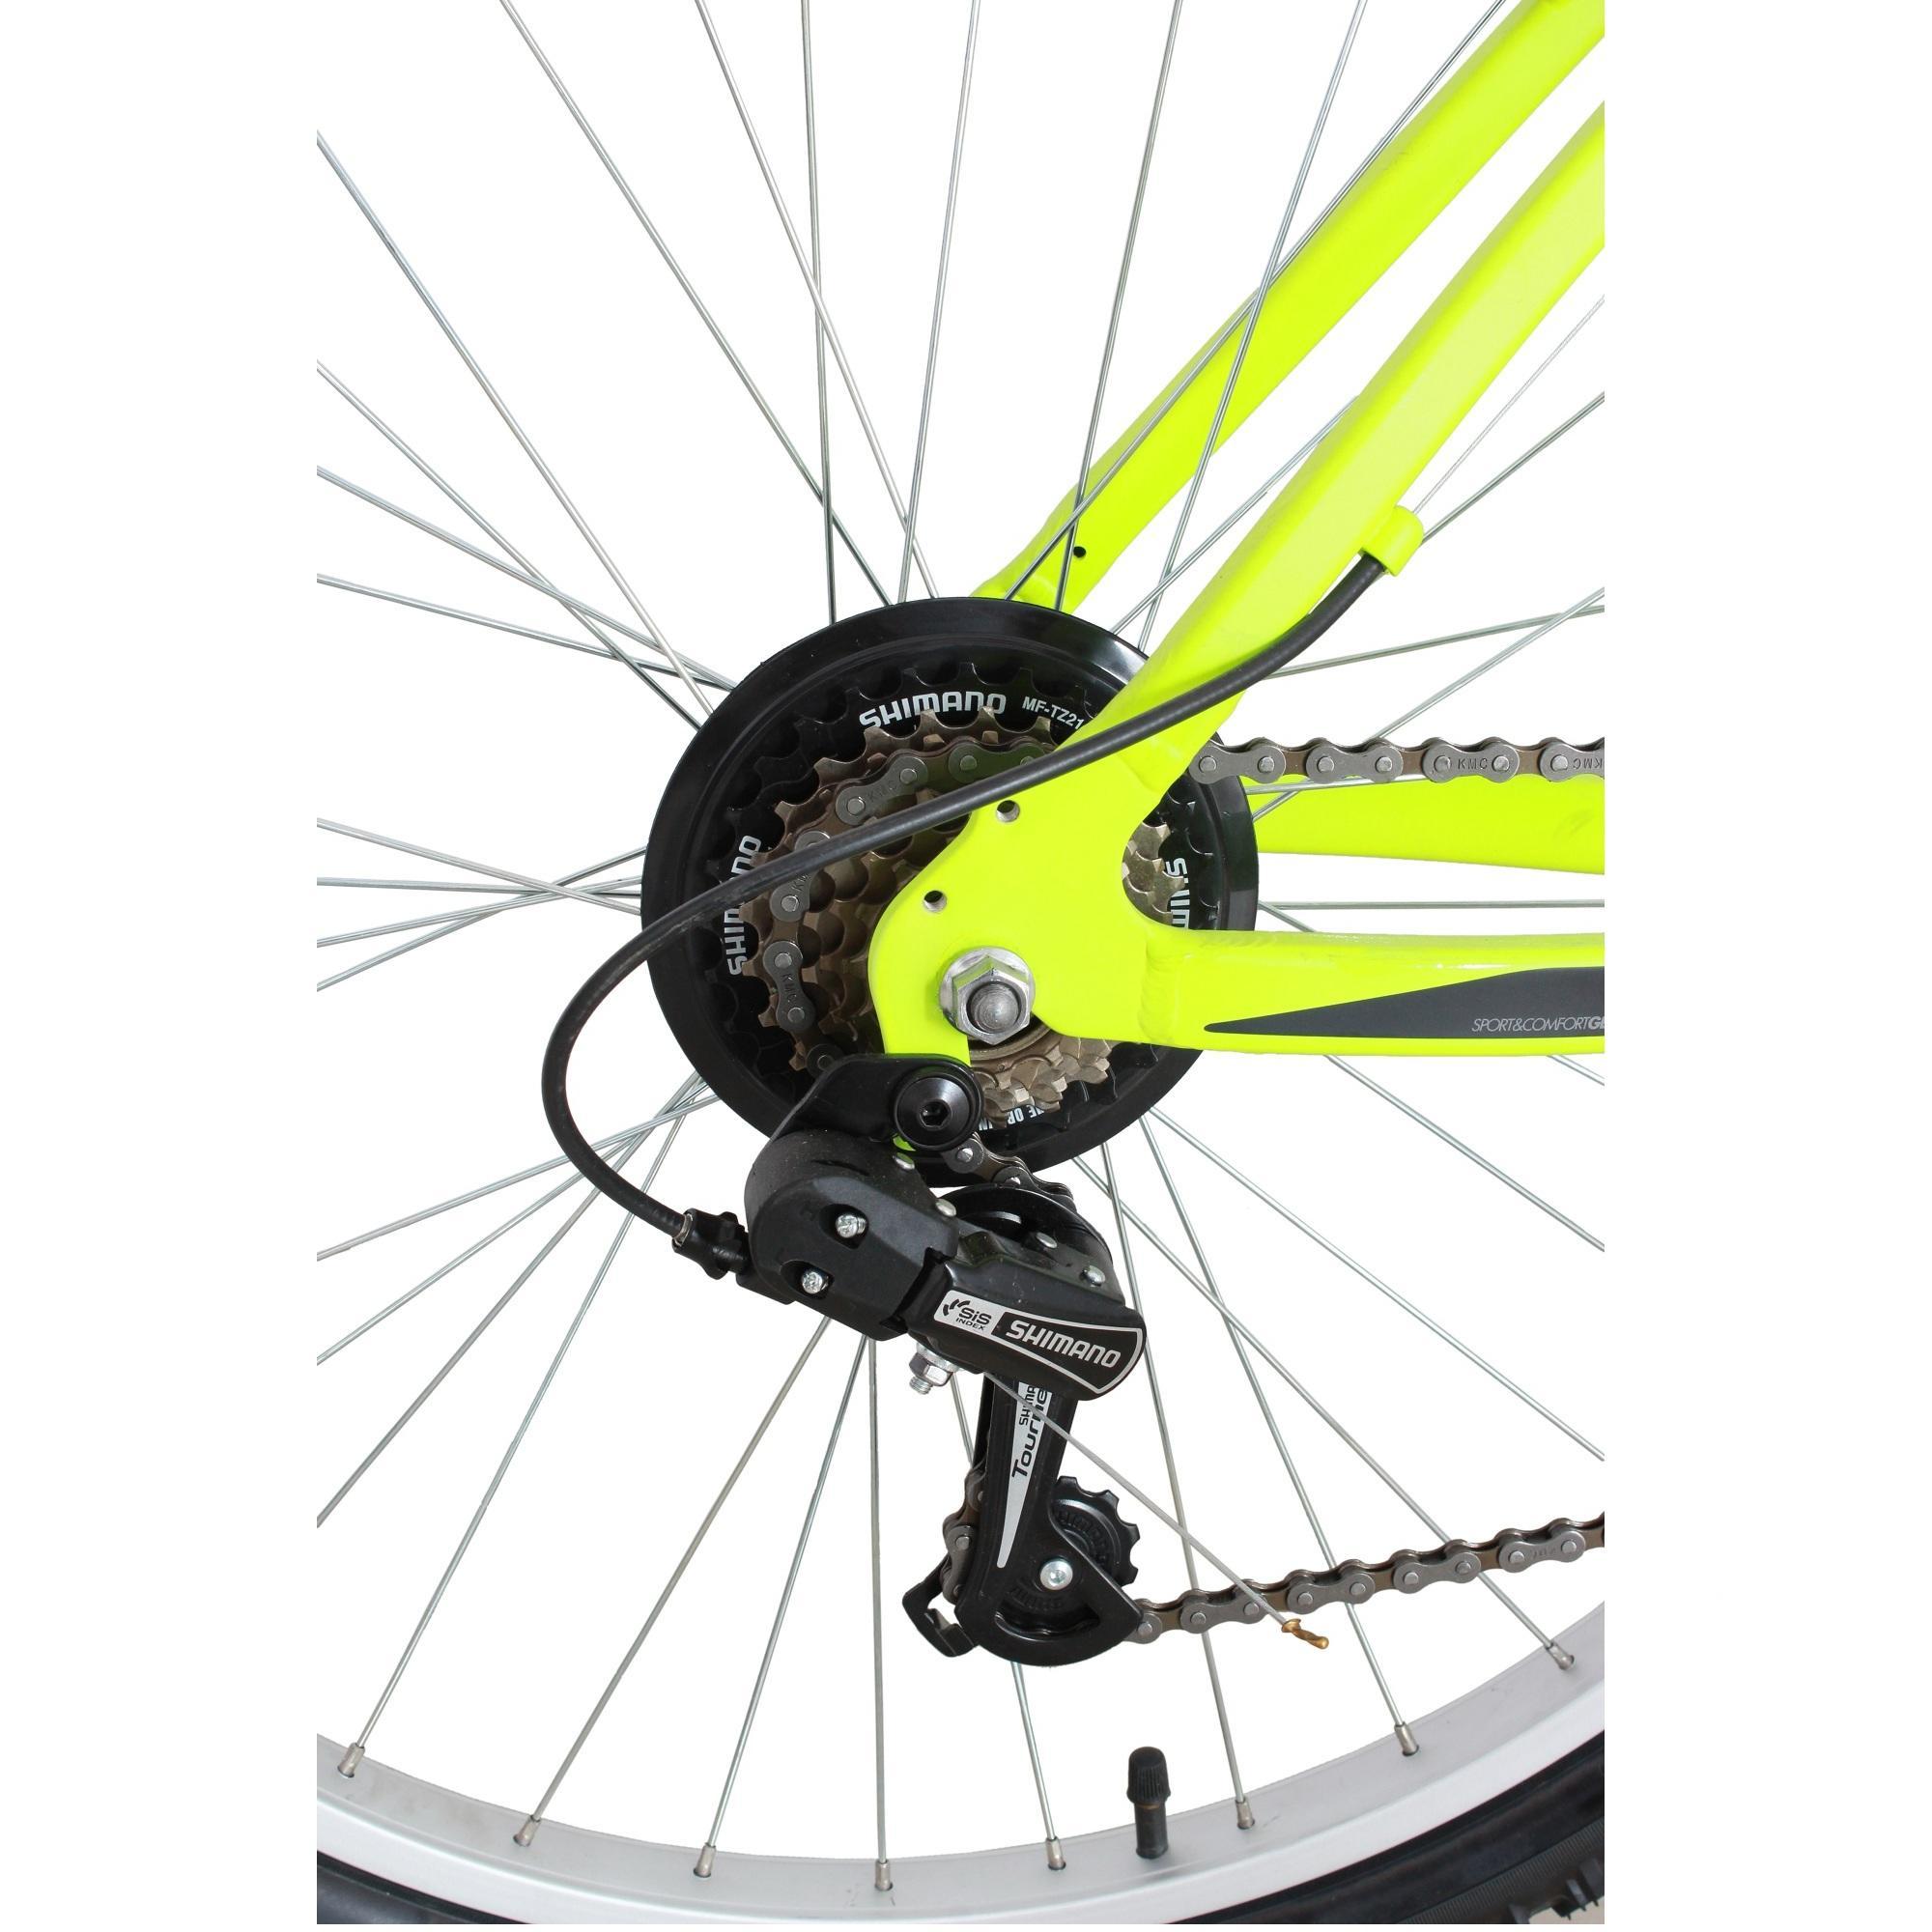 BTWIN ROCKRIDER 340 YELLOW MTB CYCLE